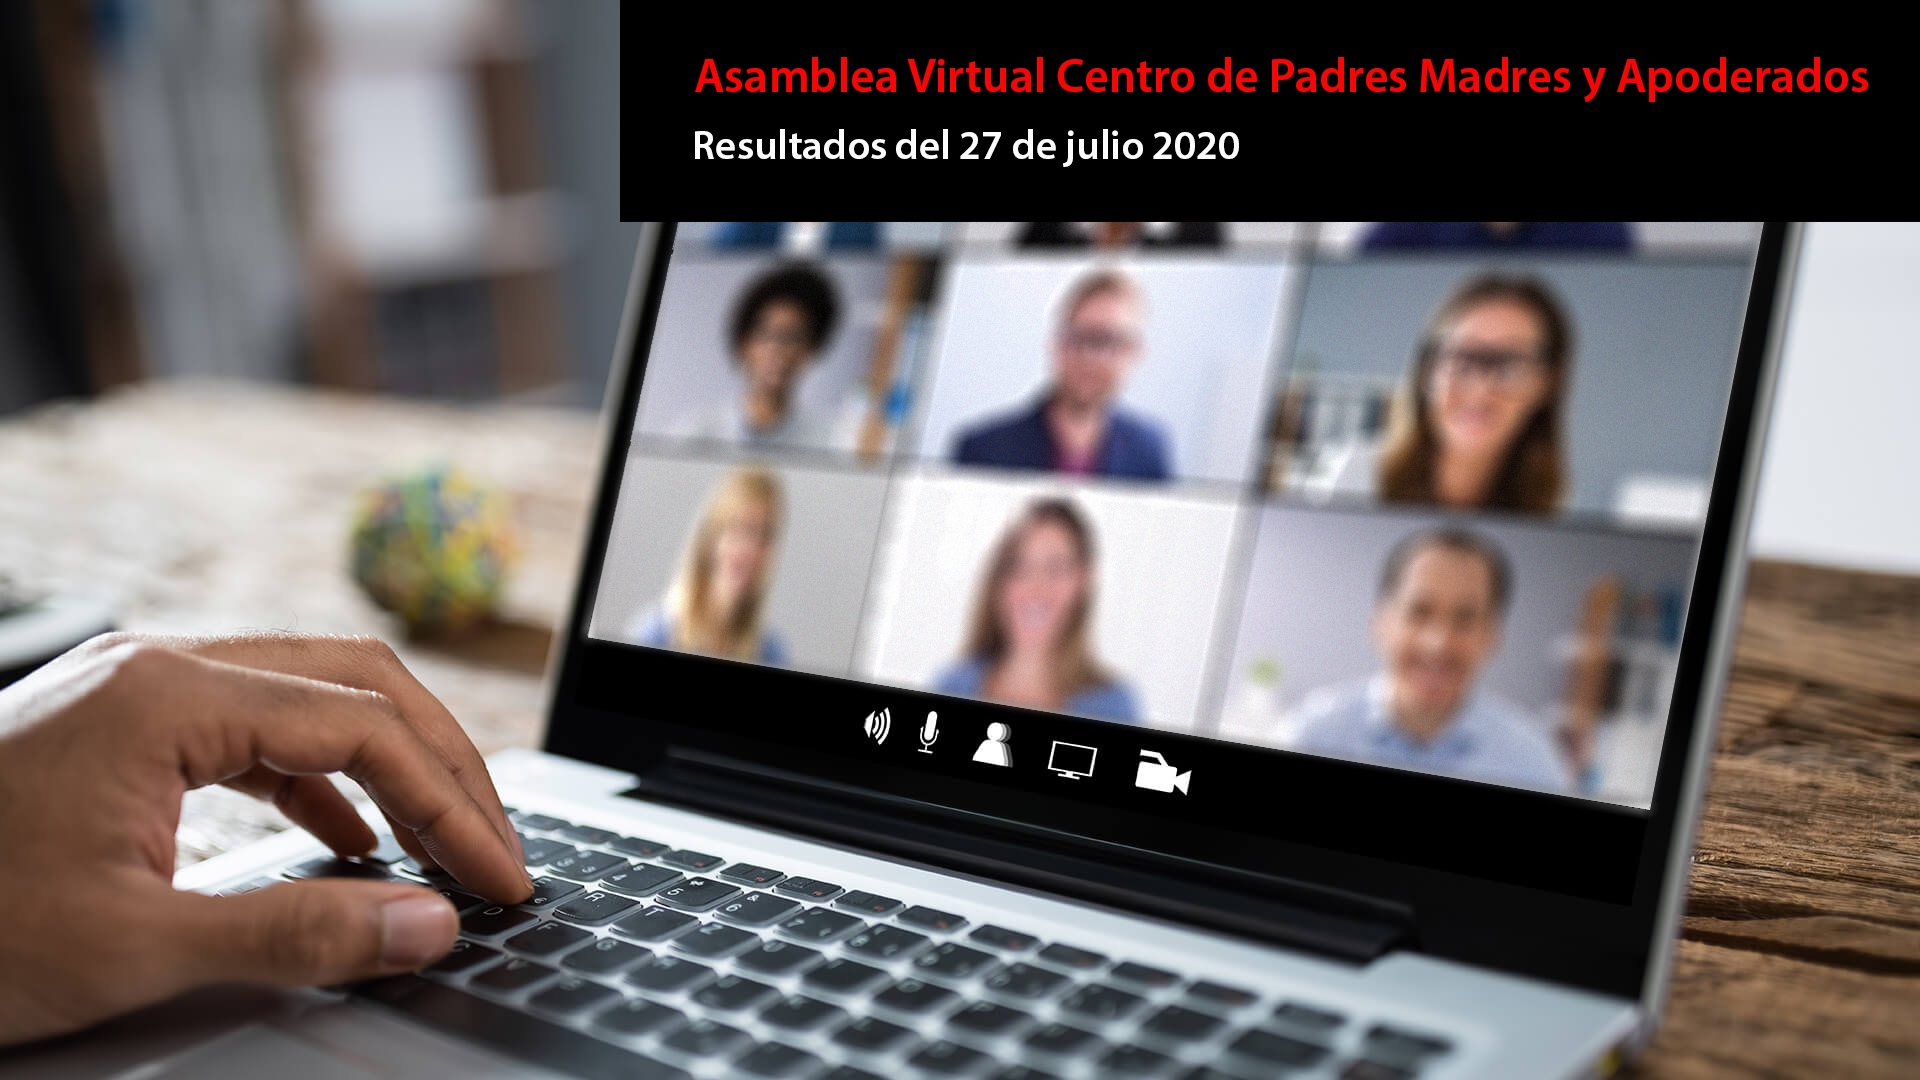 Asamblea Virtual Centro de Padres Madres y Apoderados